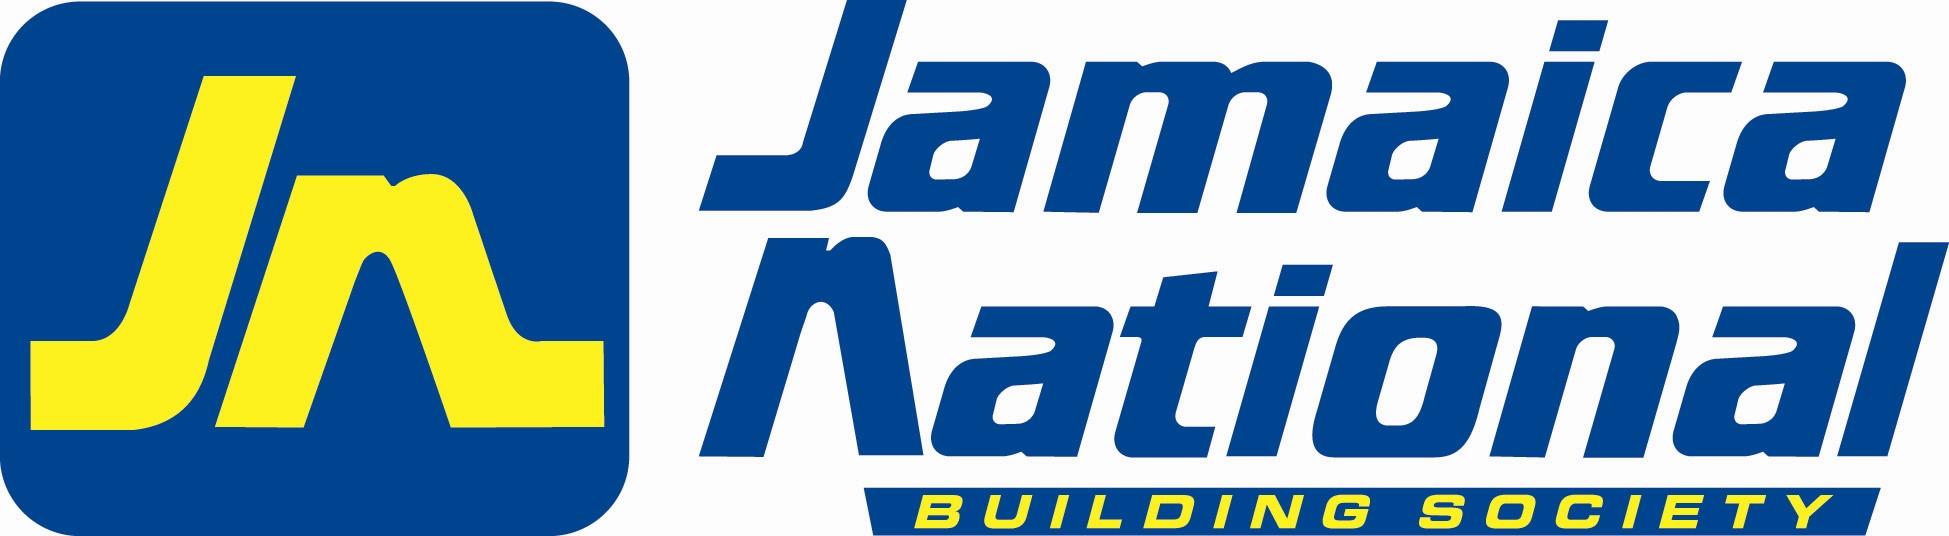 Jamaica National Building Society